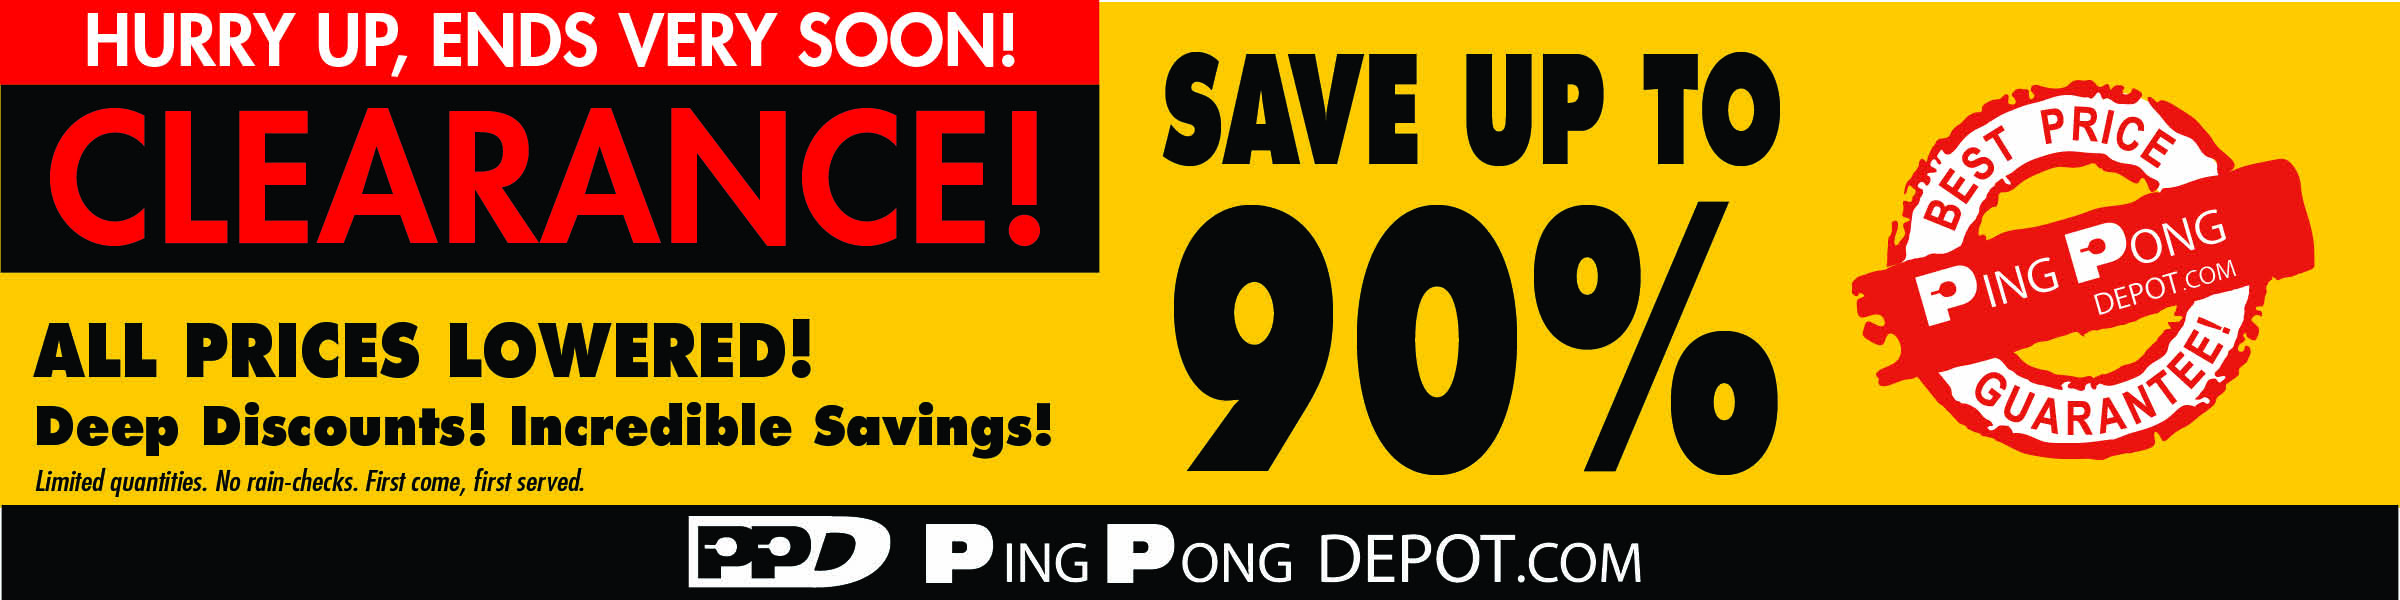 PingPongDepot com Table Tennis / Ping-Pong Equipment Store